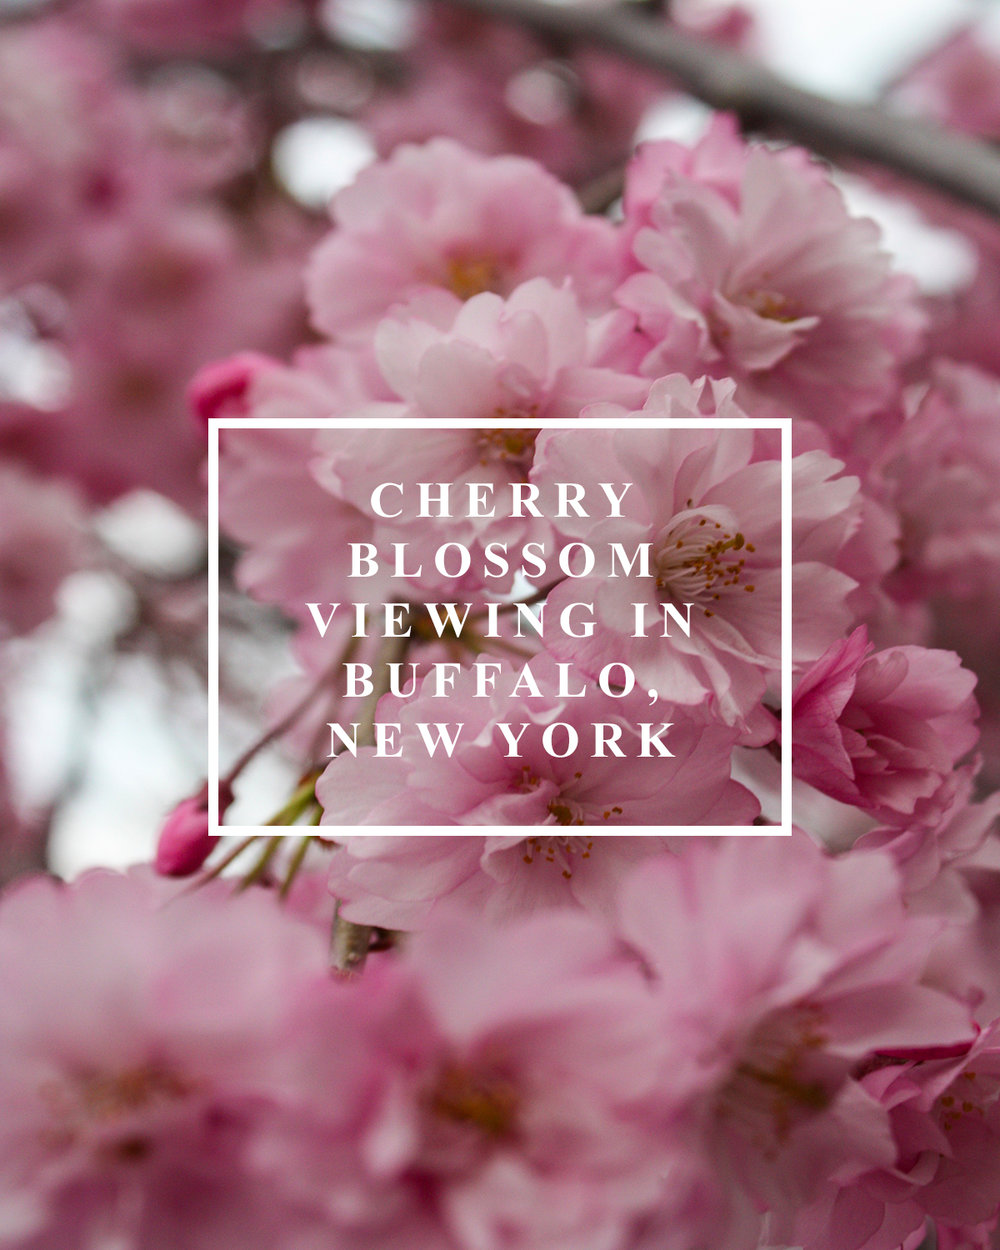 Cherry Blossom Viewing Blog Post.jpg